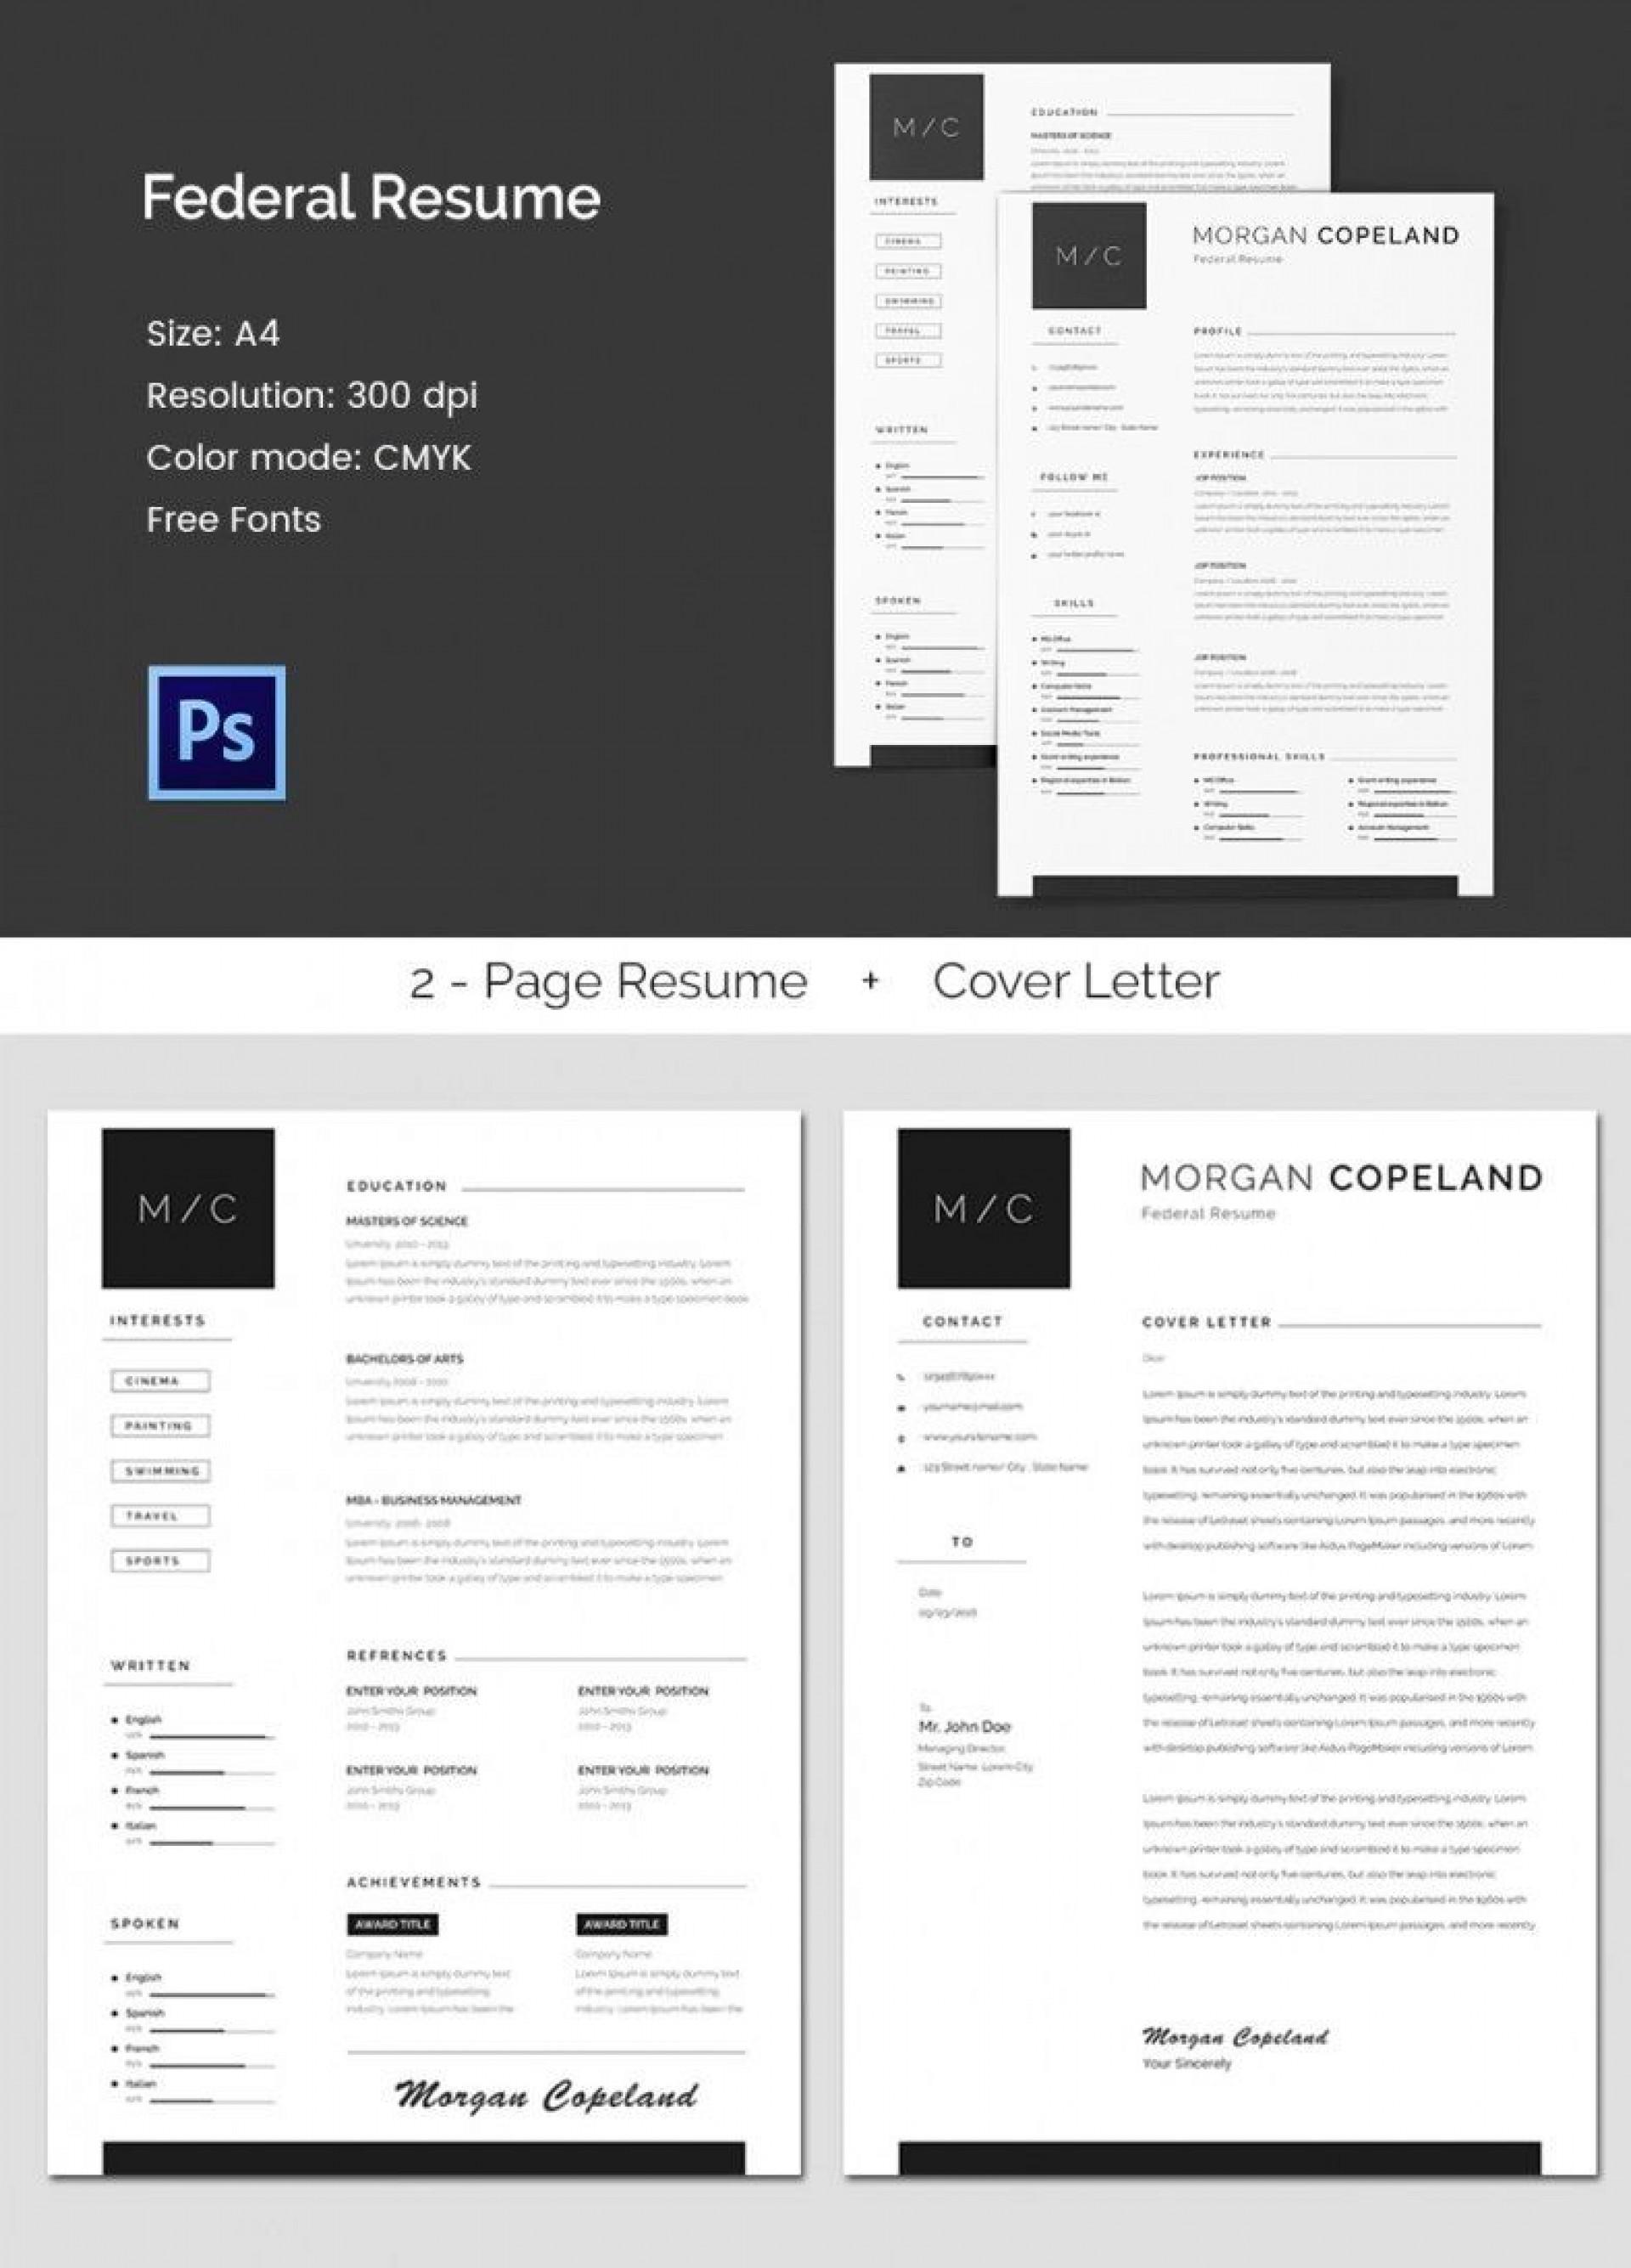 007 Fantastic Software Engineering Resume Template Highest Clarity  Engineer Microsoft Word Cv Free Developer Download1920